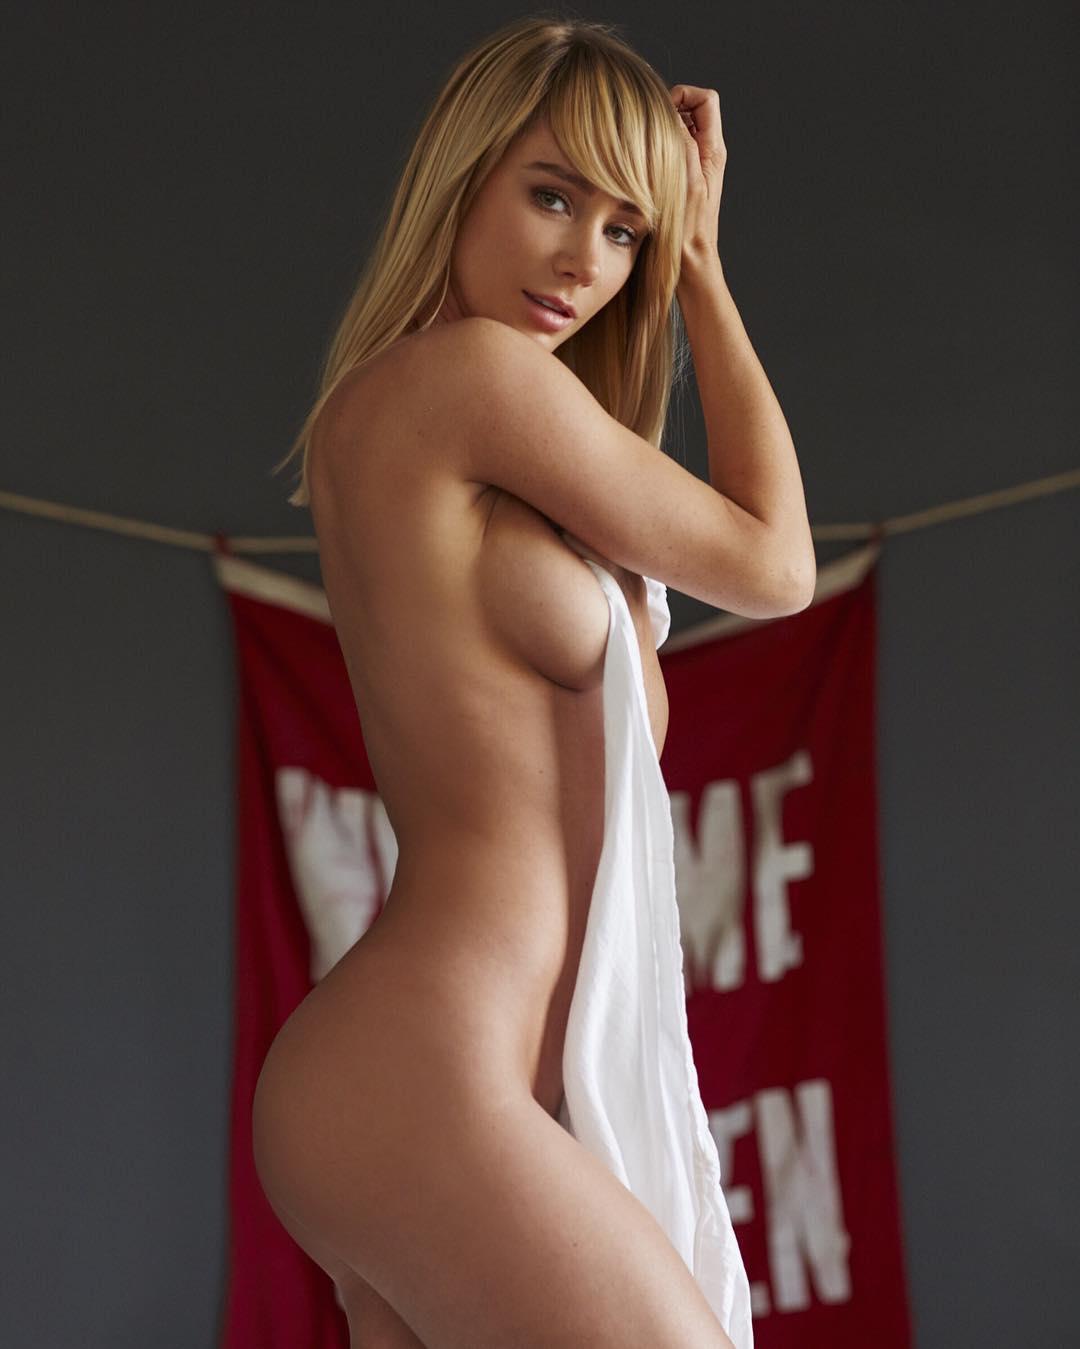 puh seksi thai hieronta gay salo